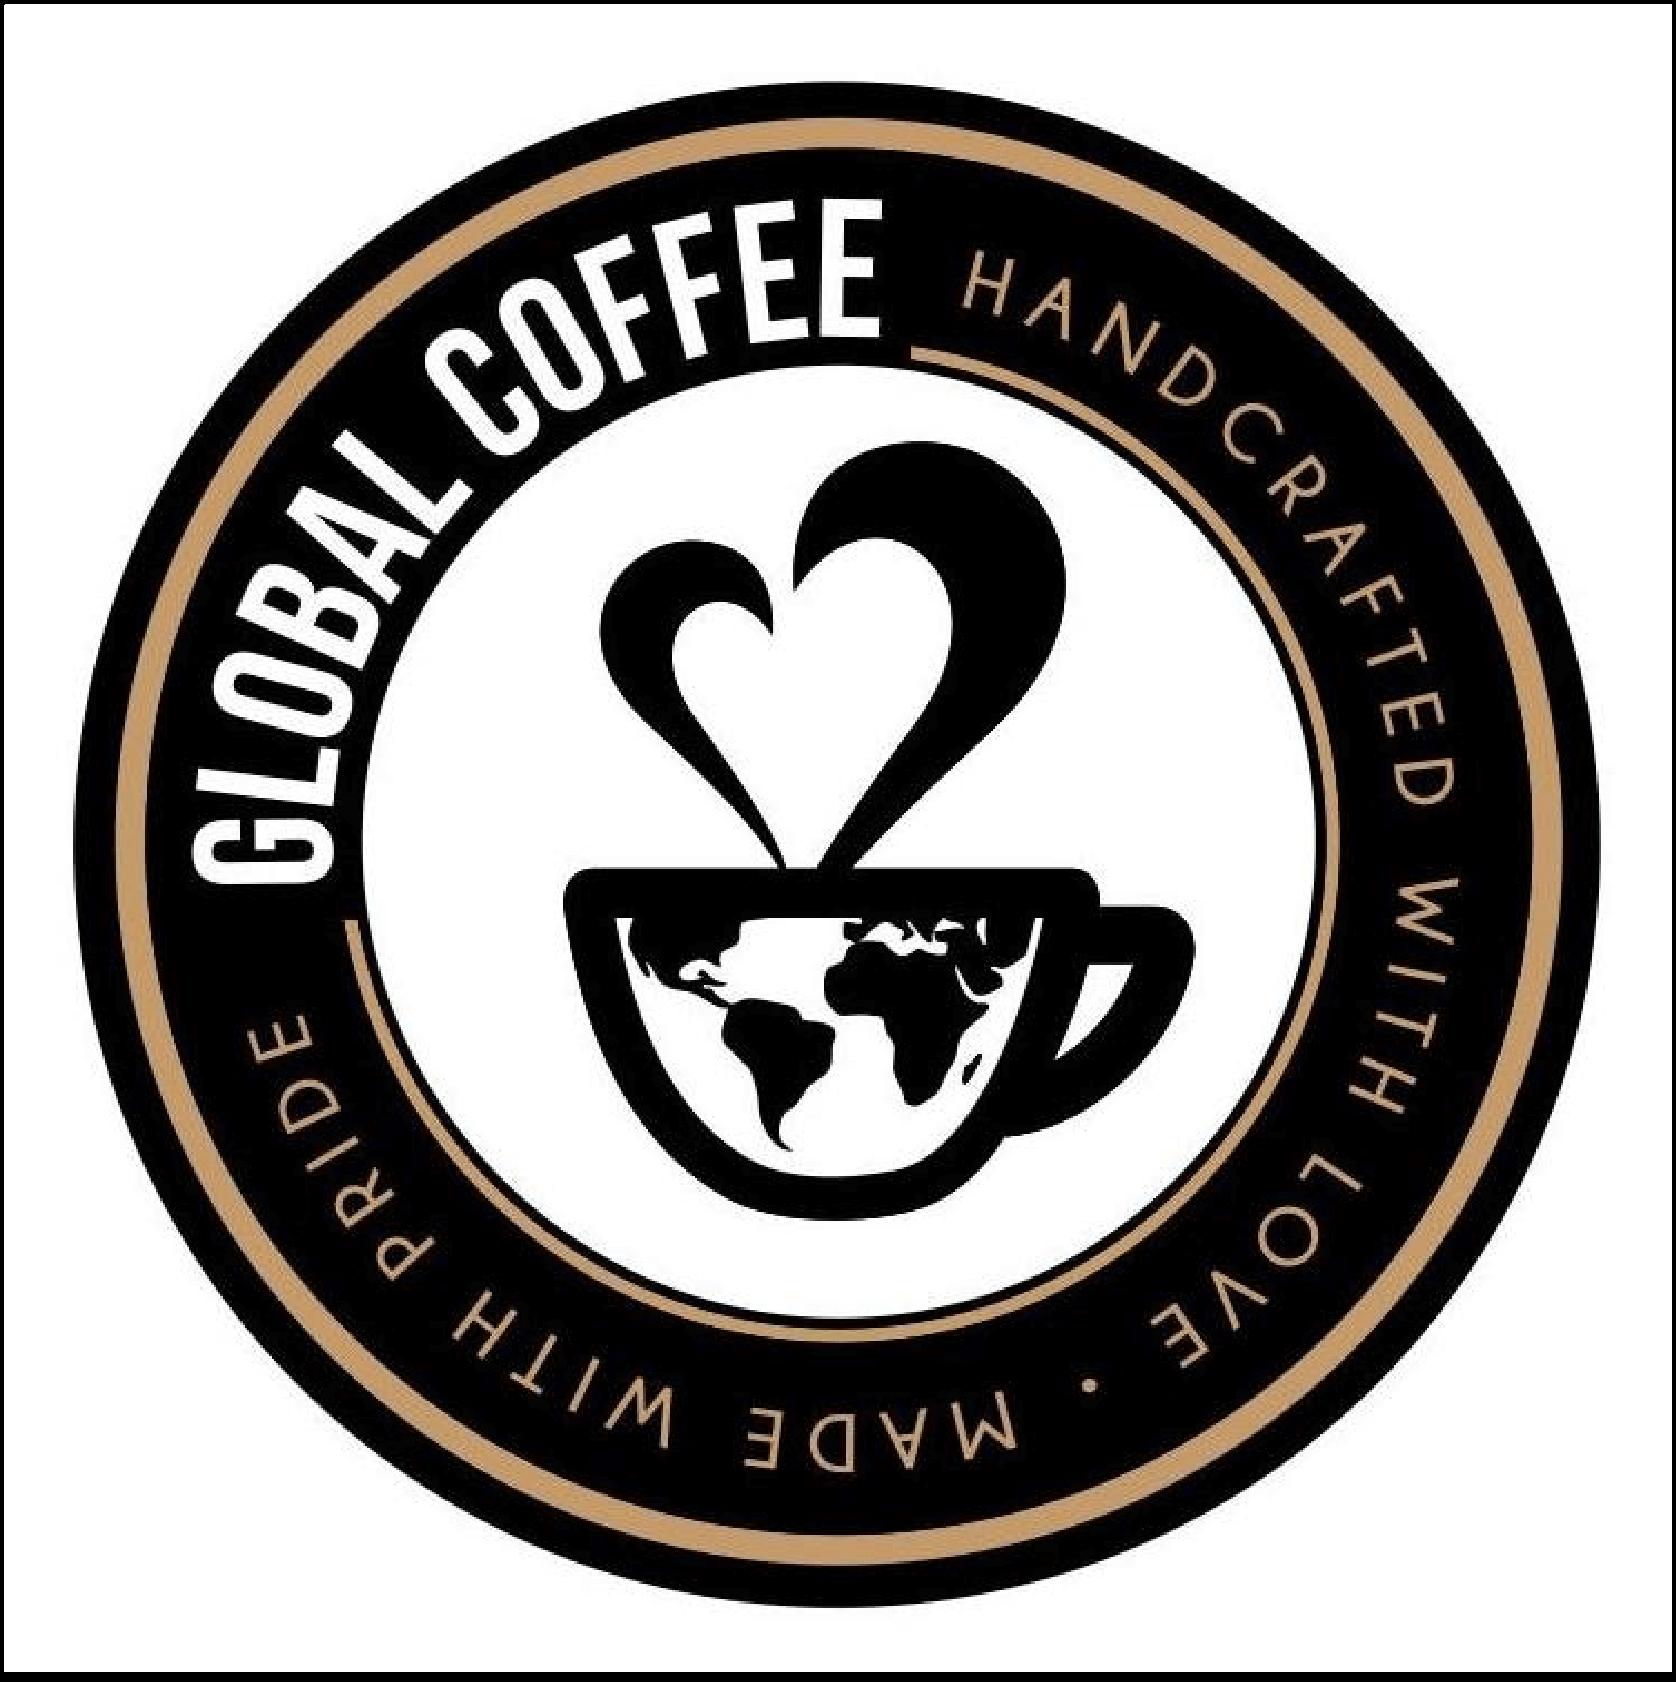 Global Coffee